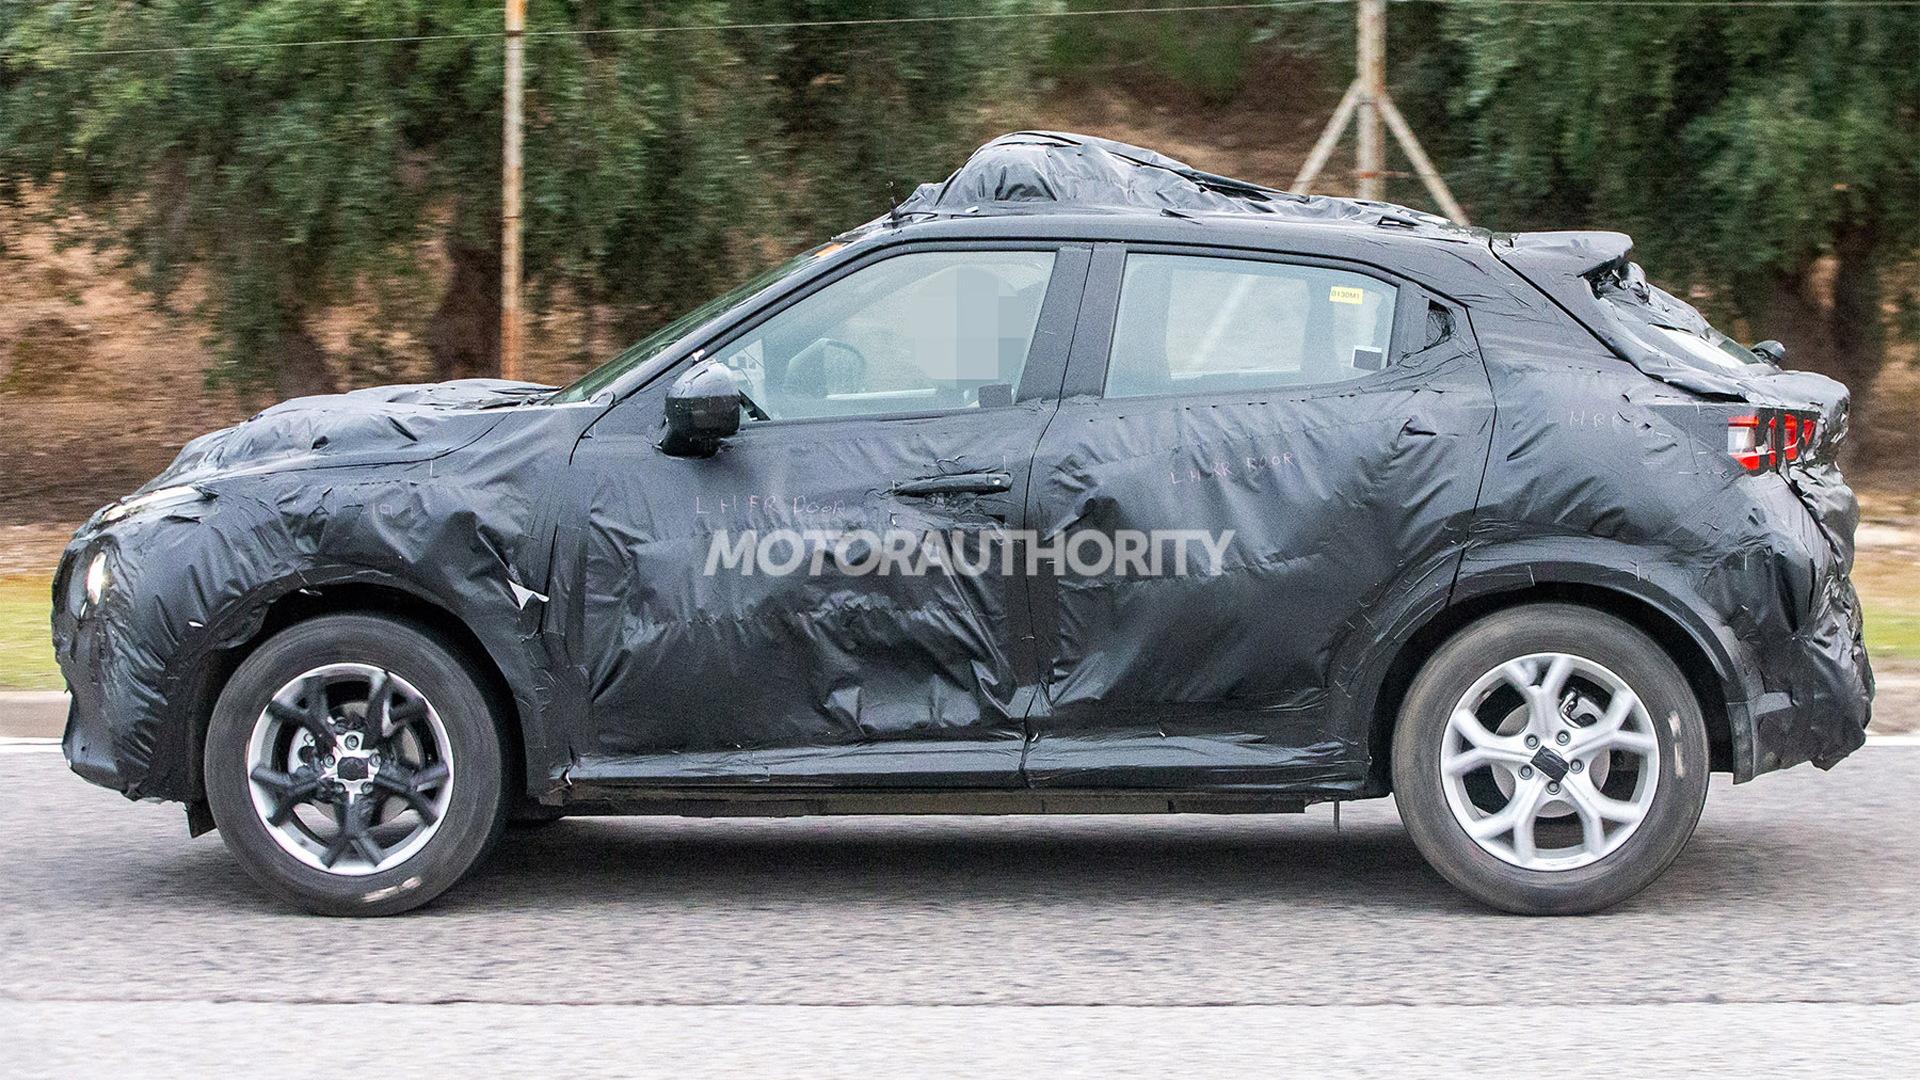 2020 Nissan Juke spy shots - Image via S. Baldauf/SB-Medien